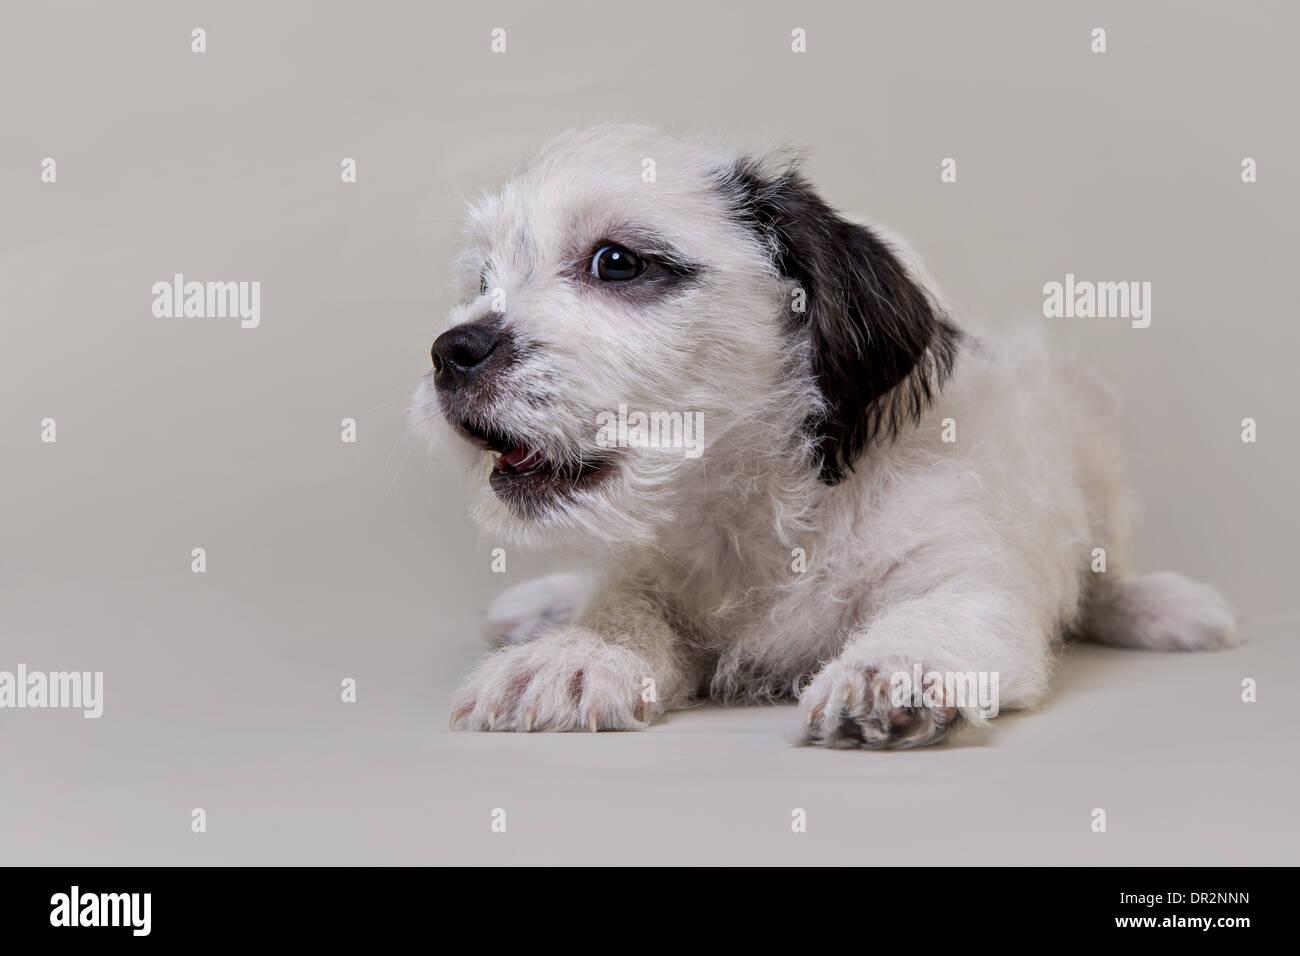 Cachorro feliz sonriendo en gris claro studio como telón de fondo. Imagen De Stock